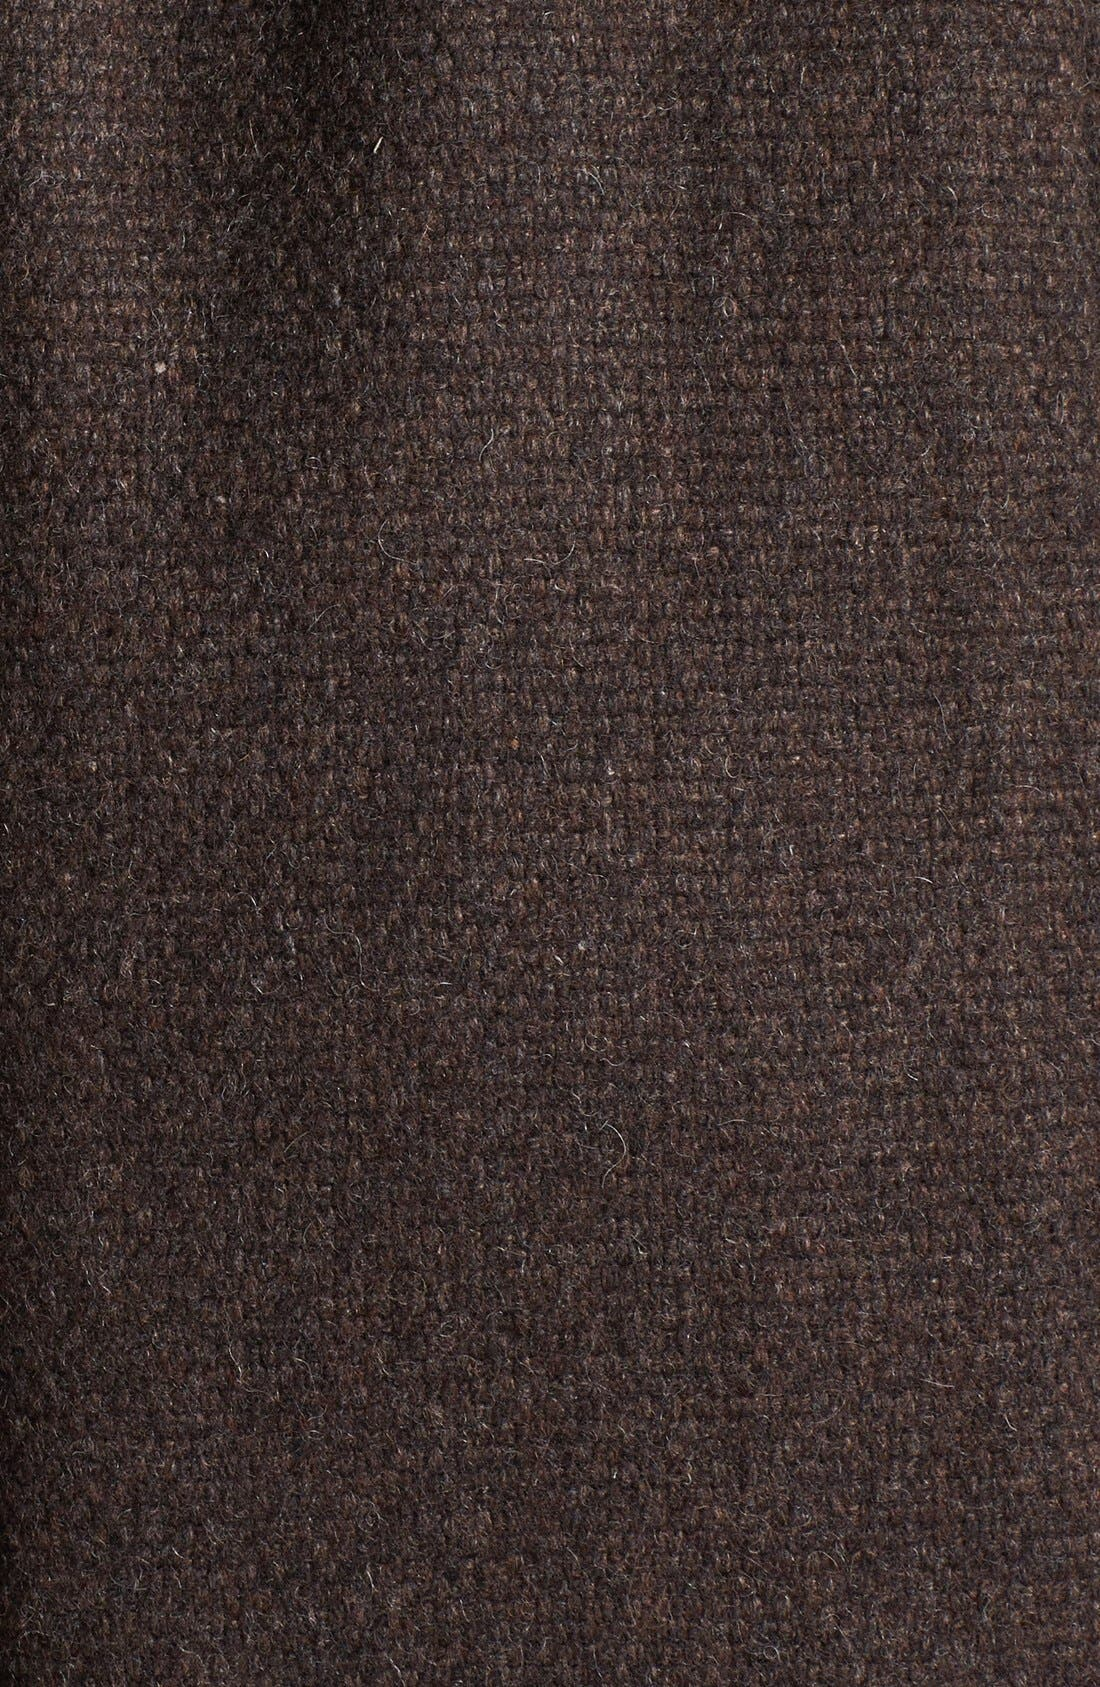 Alternate Image 3  - Ellen Tracy Genuine Fox Fur Trim Hooded Coat (Petite) (Online Only)